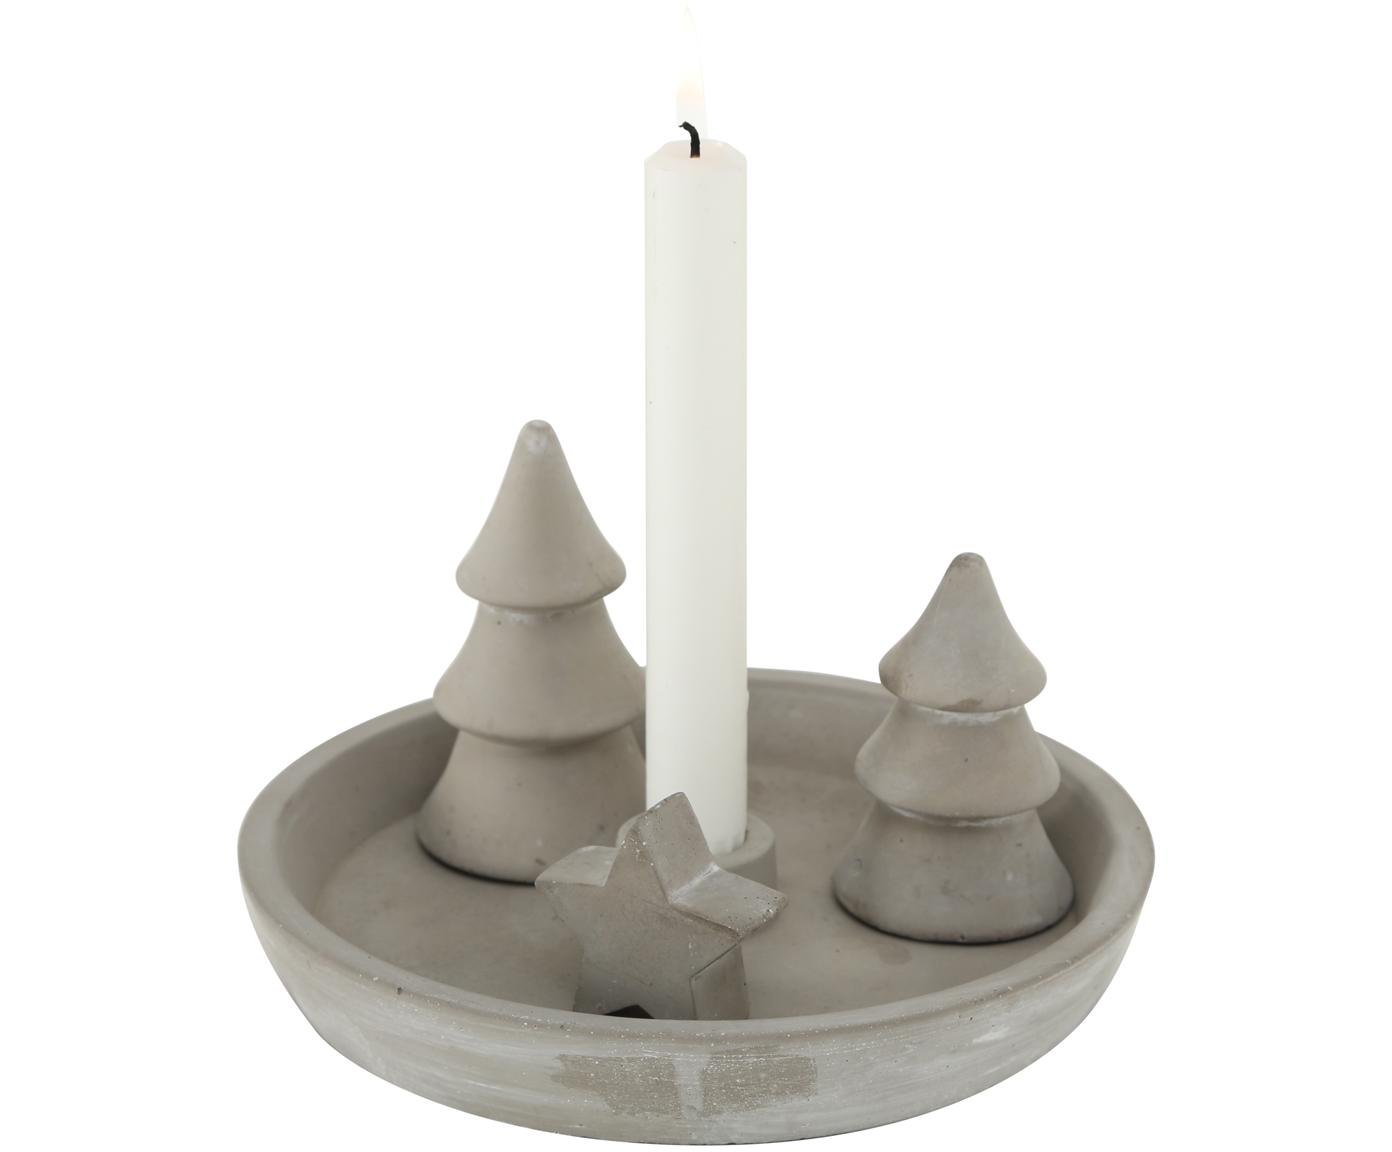 Set candelabro Bolek, 4pzas., Cemento, Gris, Ø 20 x Al 11 cm